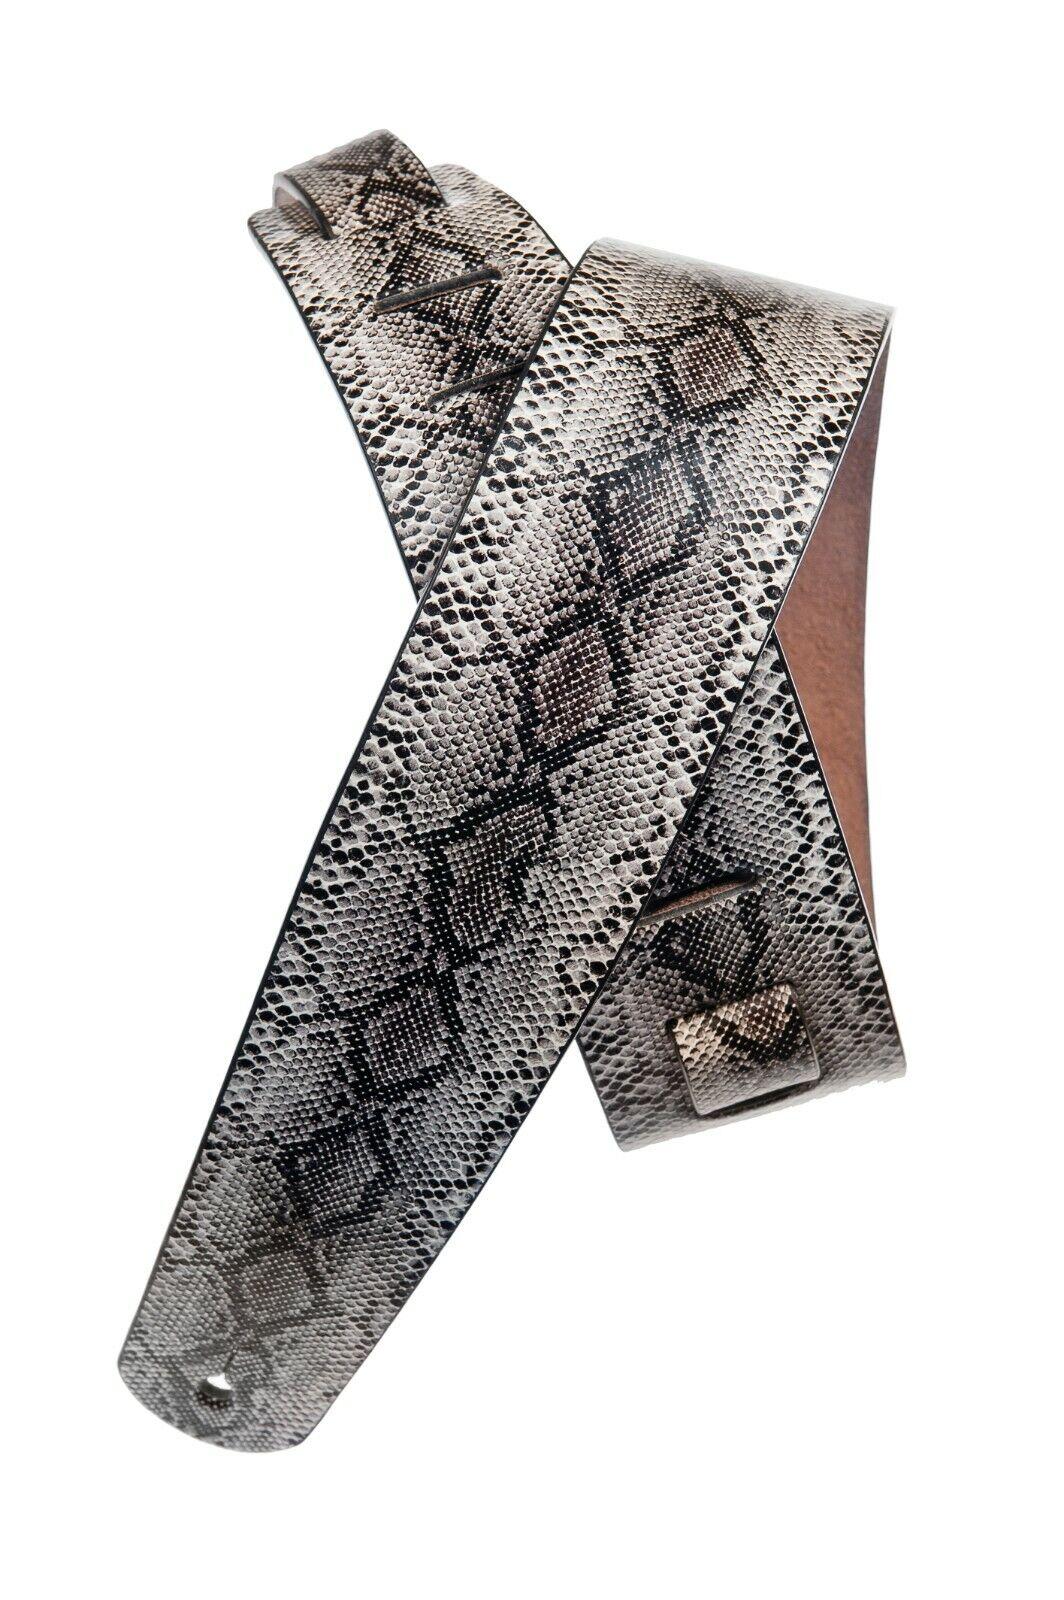 Python Snake Skin Design Leather Guitar Strap D'Addario  Pla